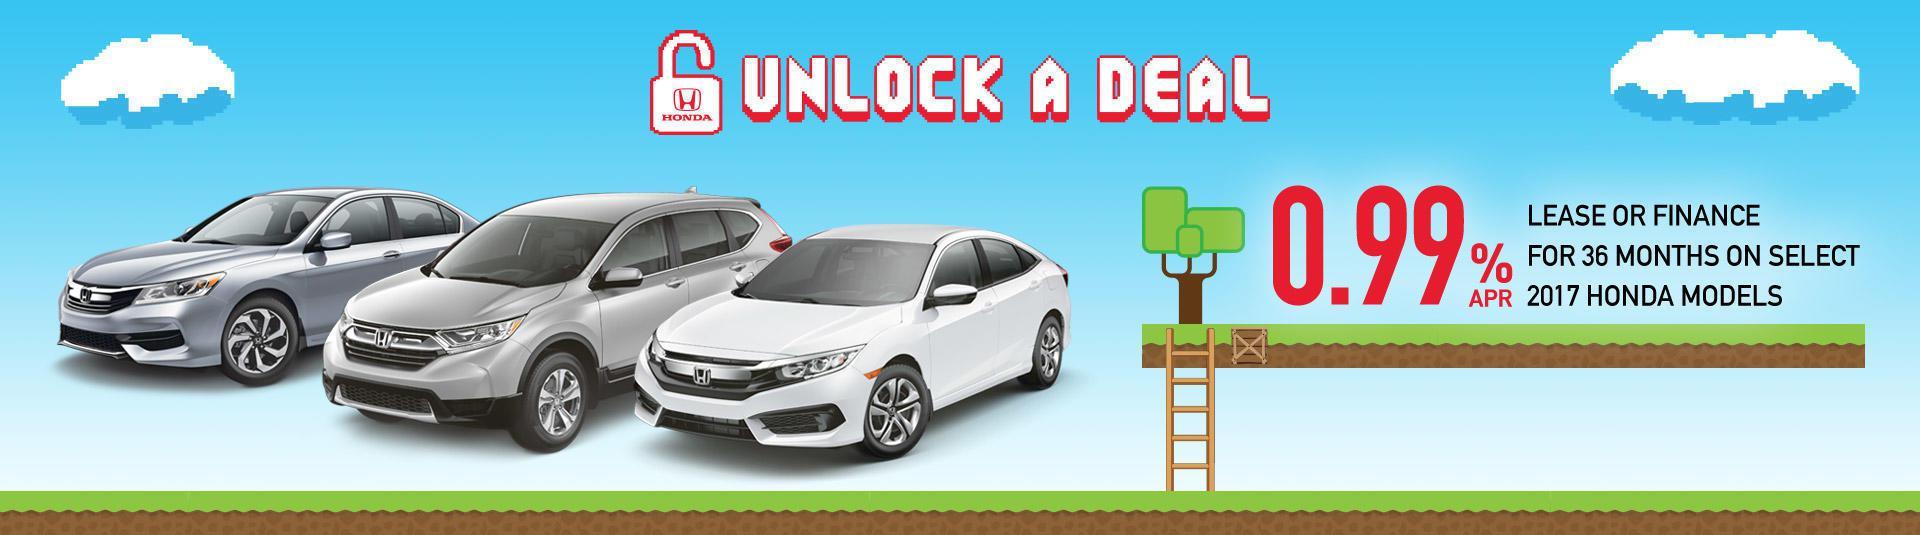 Honda Unlock A Deal Promotion